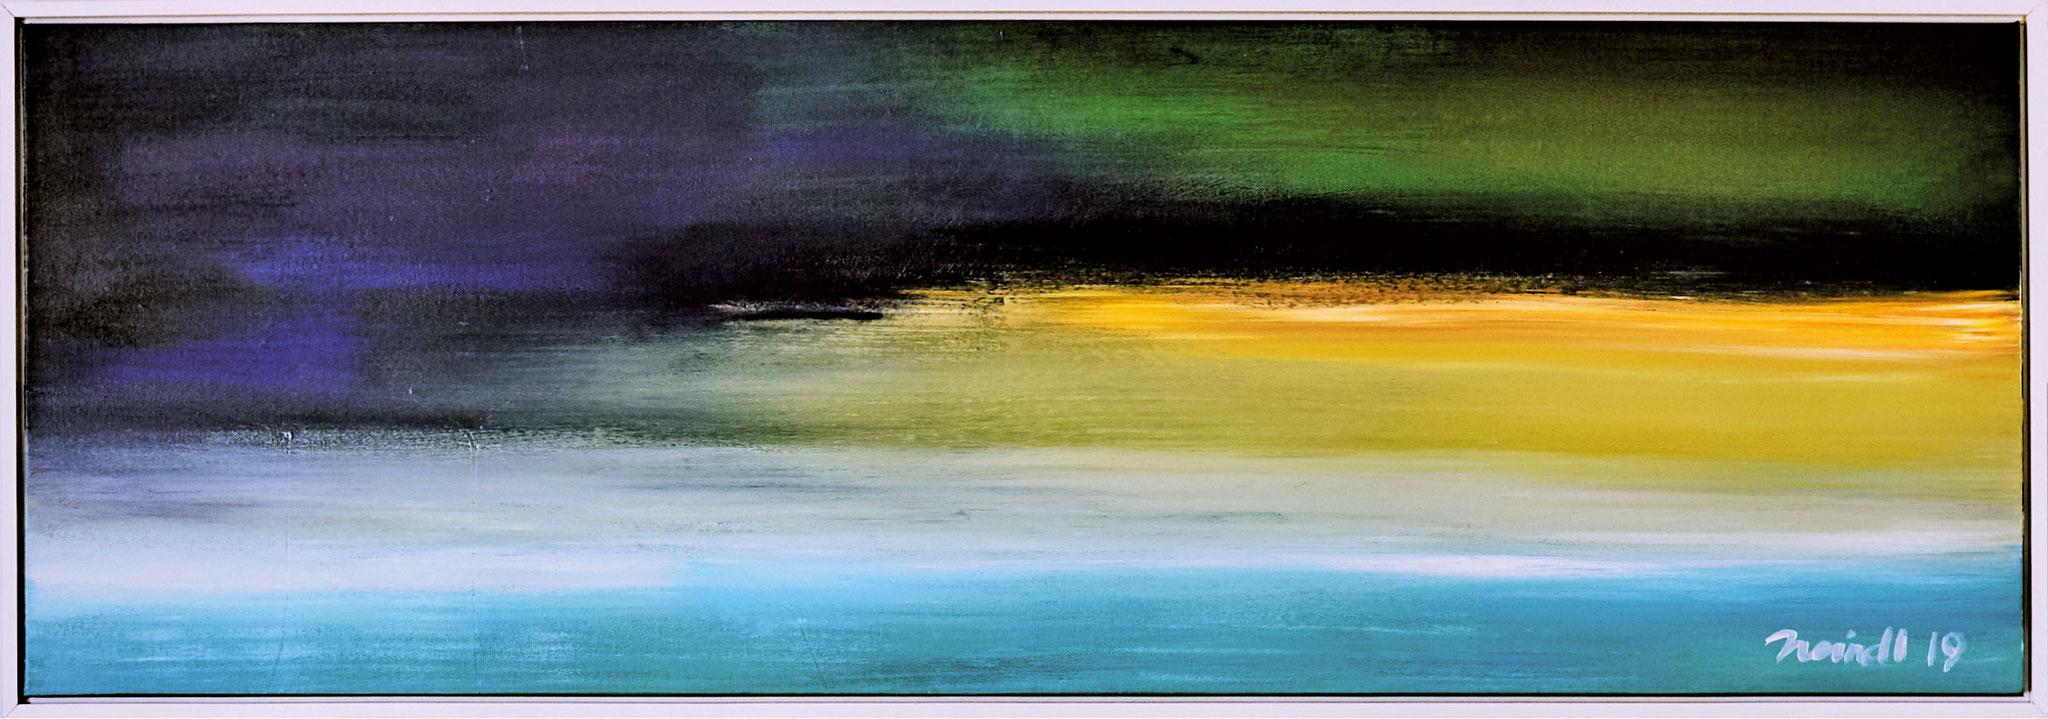 ›Landschaft‹, Acryl auf Leinwand, 123 x 43 cm, 2019